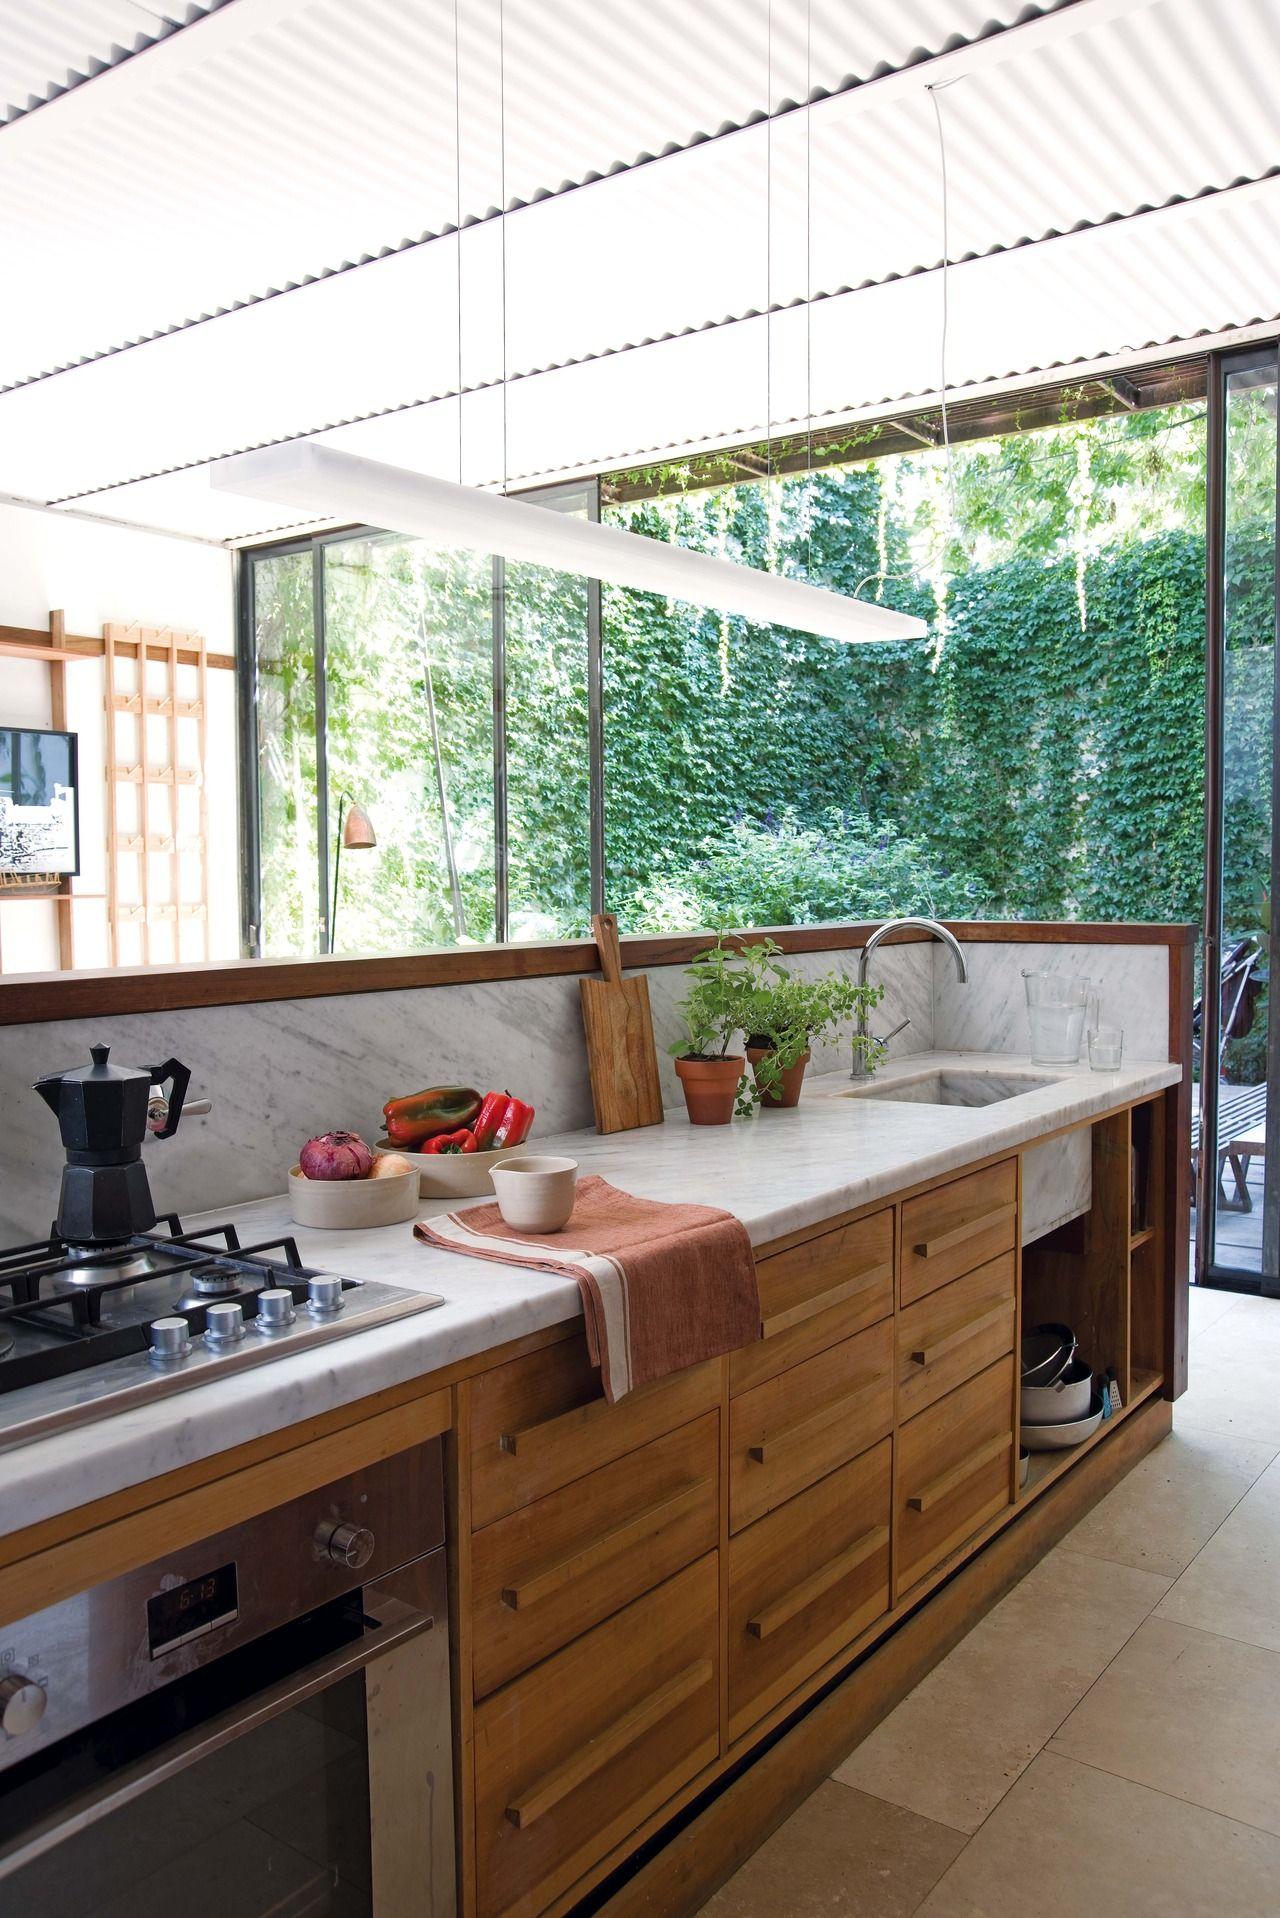 Cocinas madera clara cocina blanca madera clara - Cocinas madera clara ...